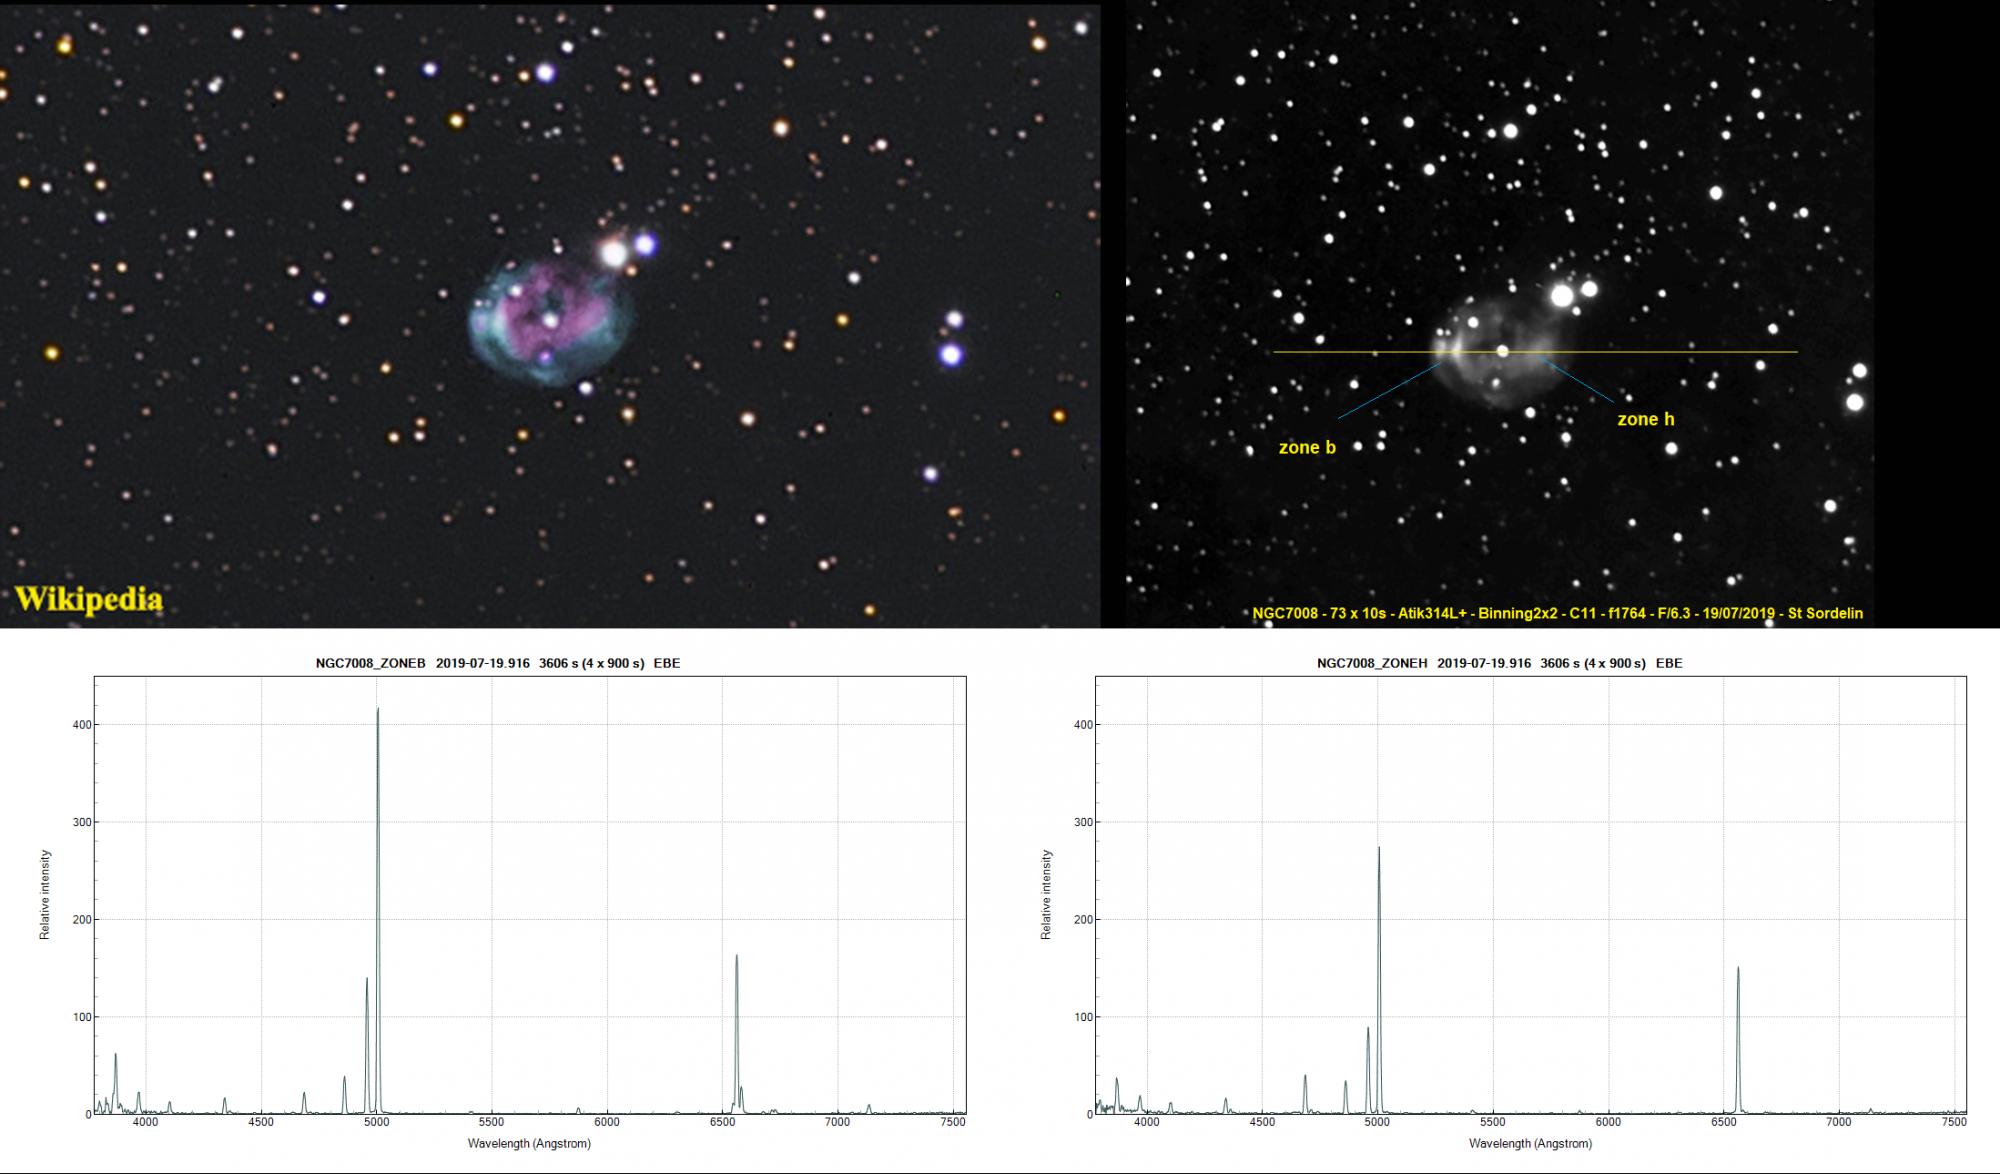 NGC7008_poster.png